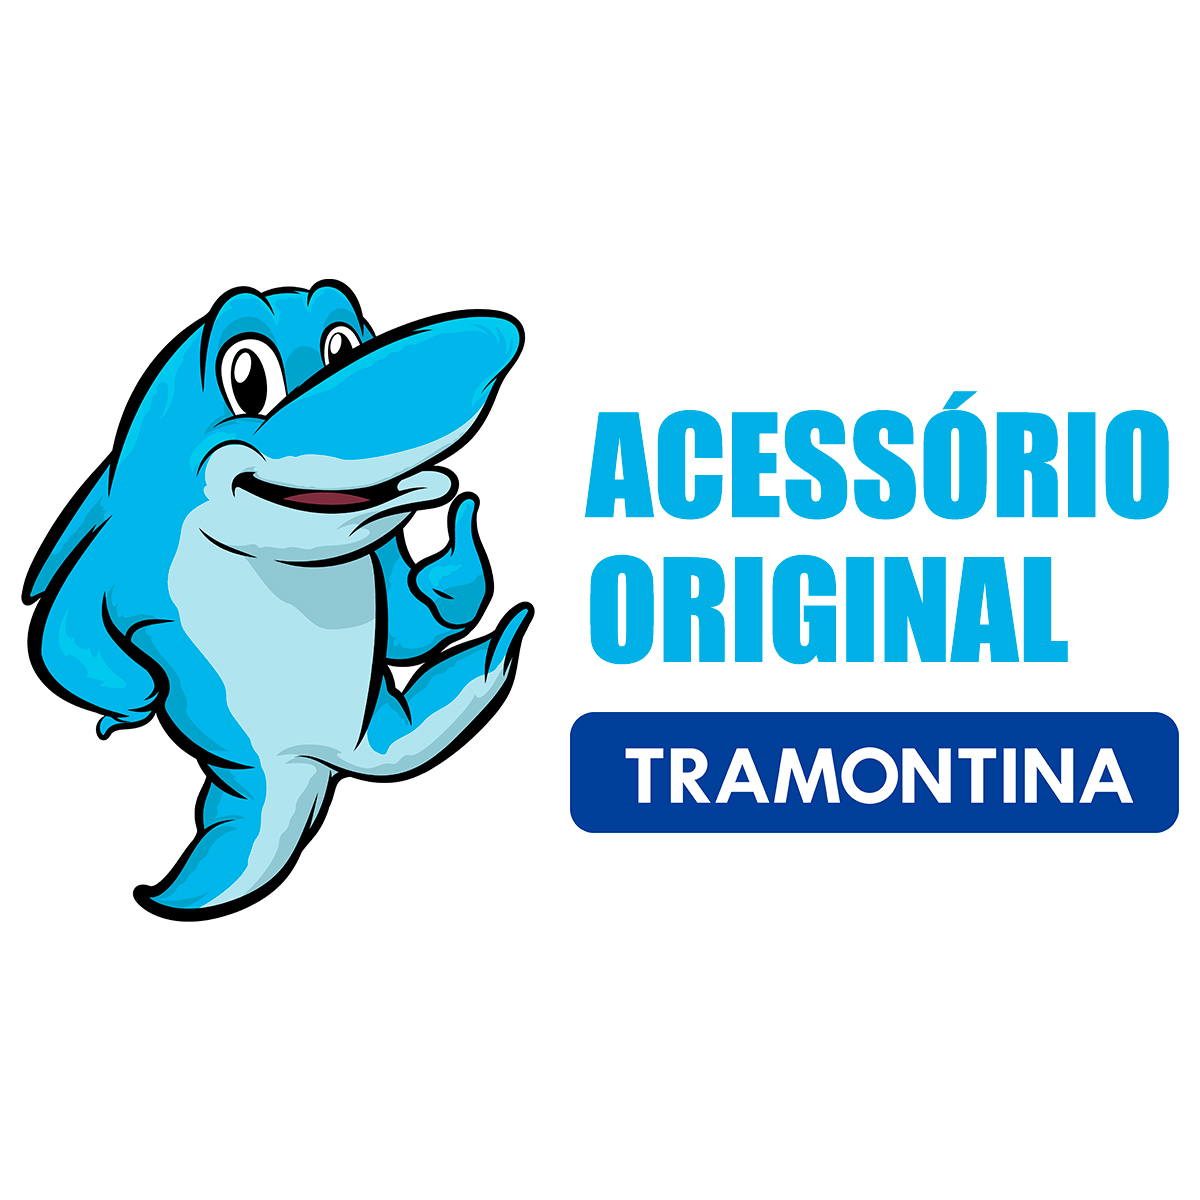 Lança Bico para Lavadora Tramontina 1500psi 1200w, 1600psi 1400w Original